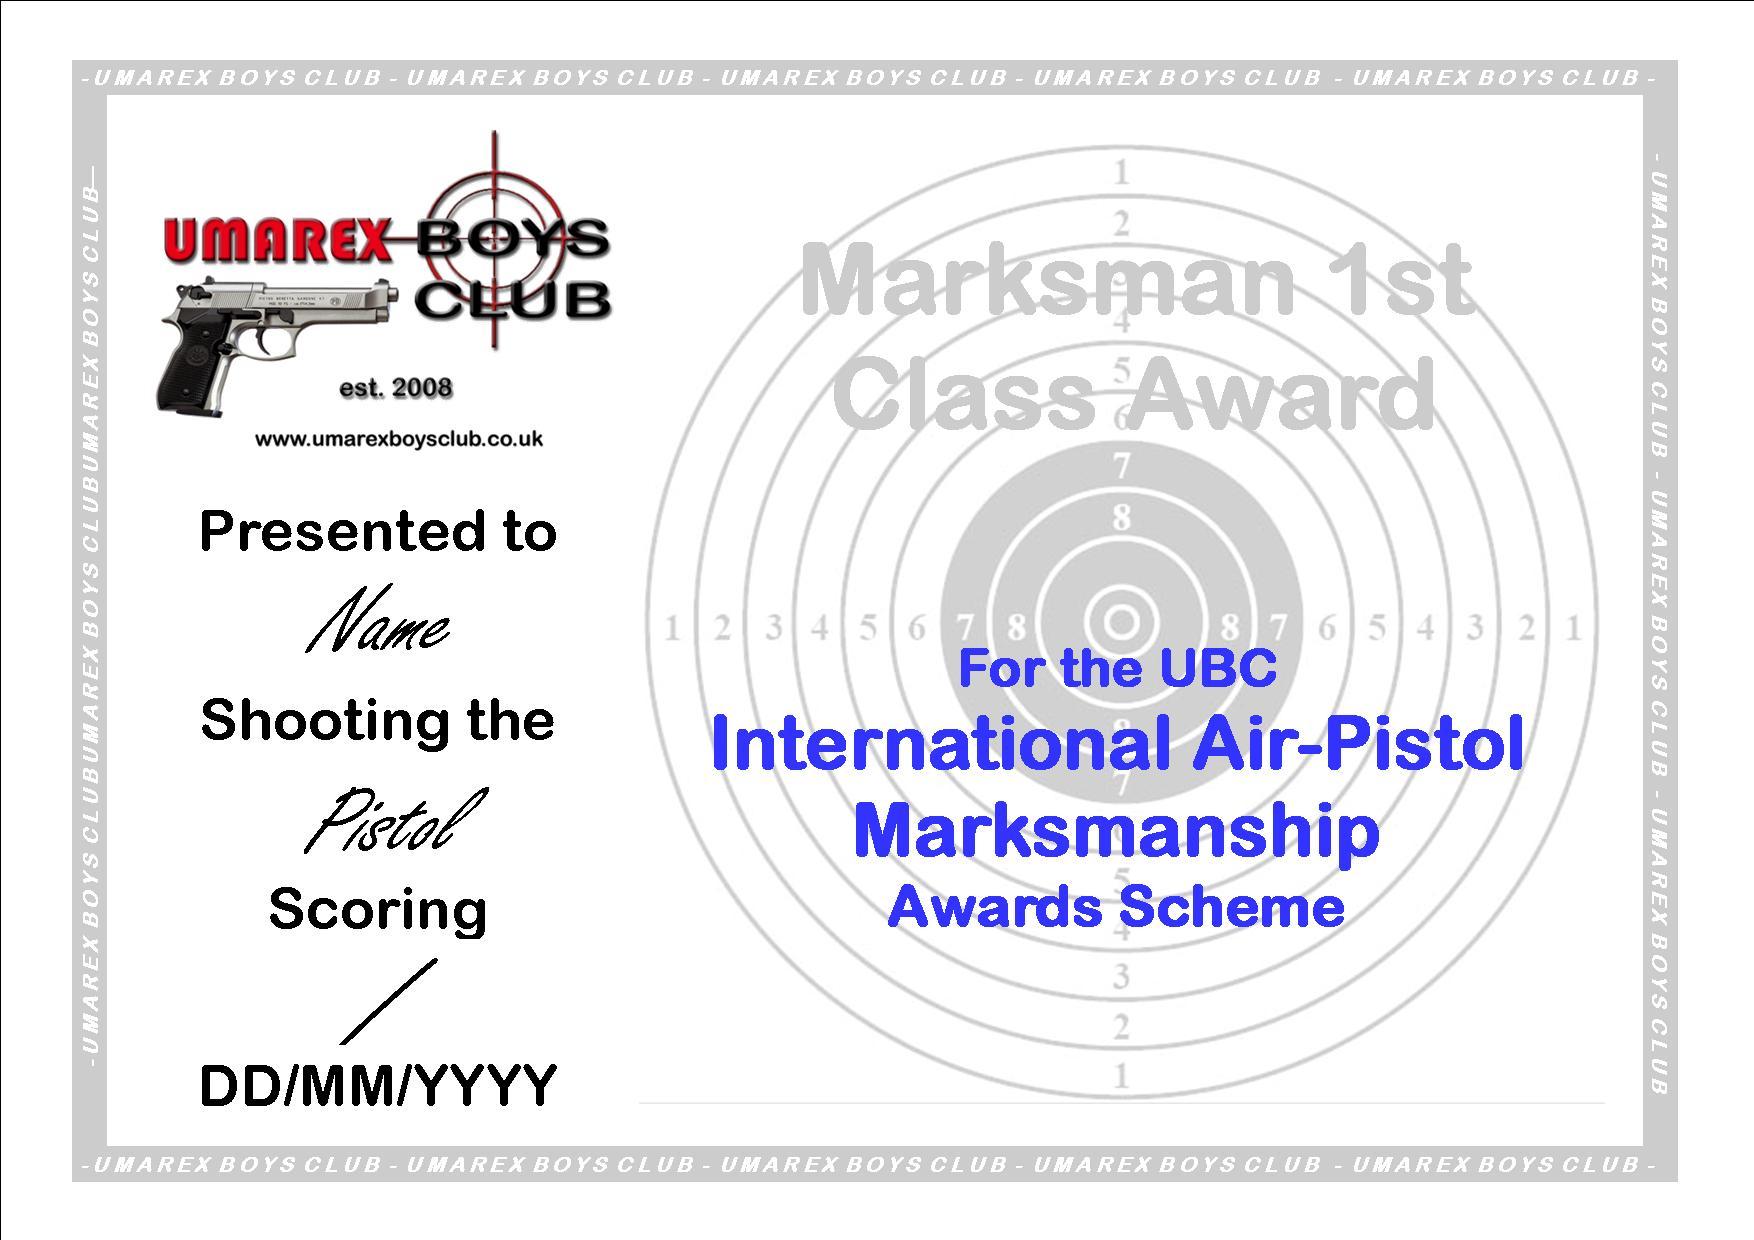 Ubc marksman award scheme certificates marksman 1st class silver grade certificate xflitez Choice Image